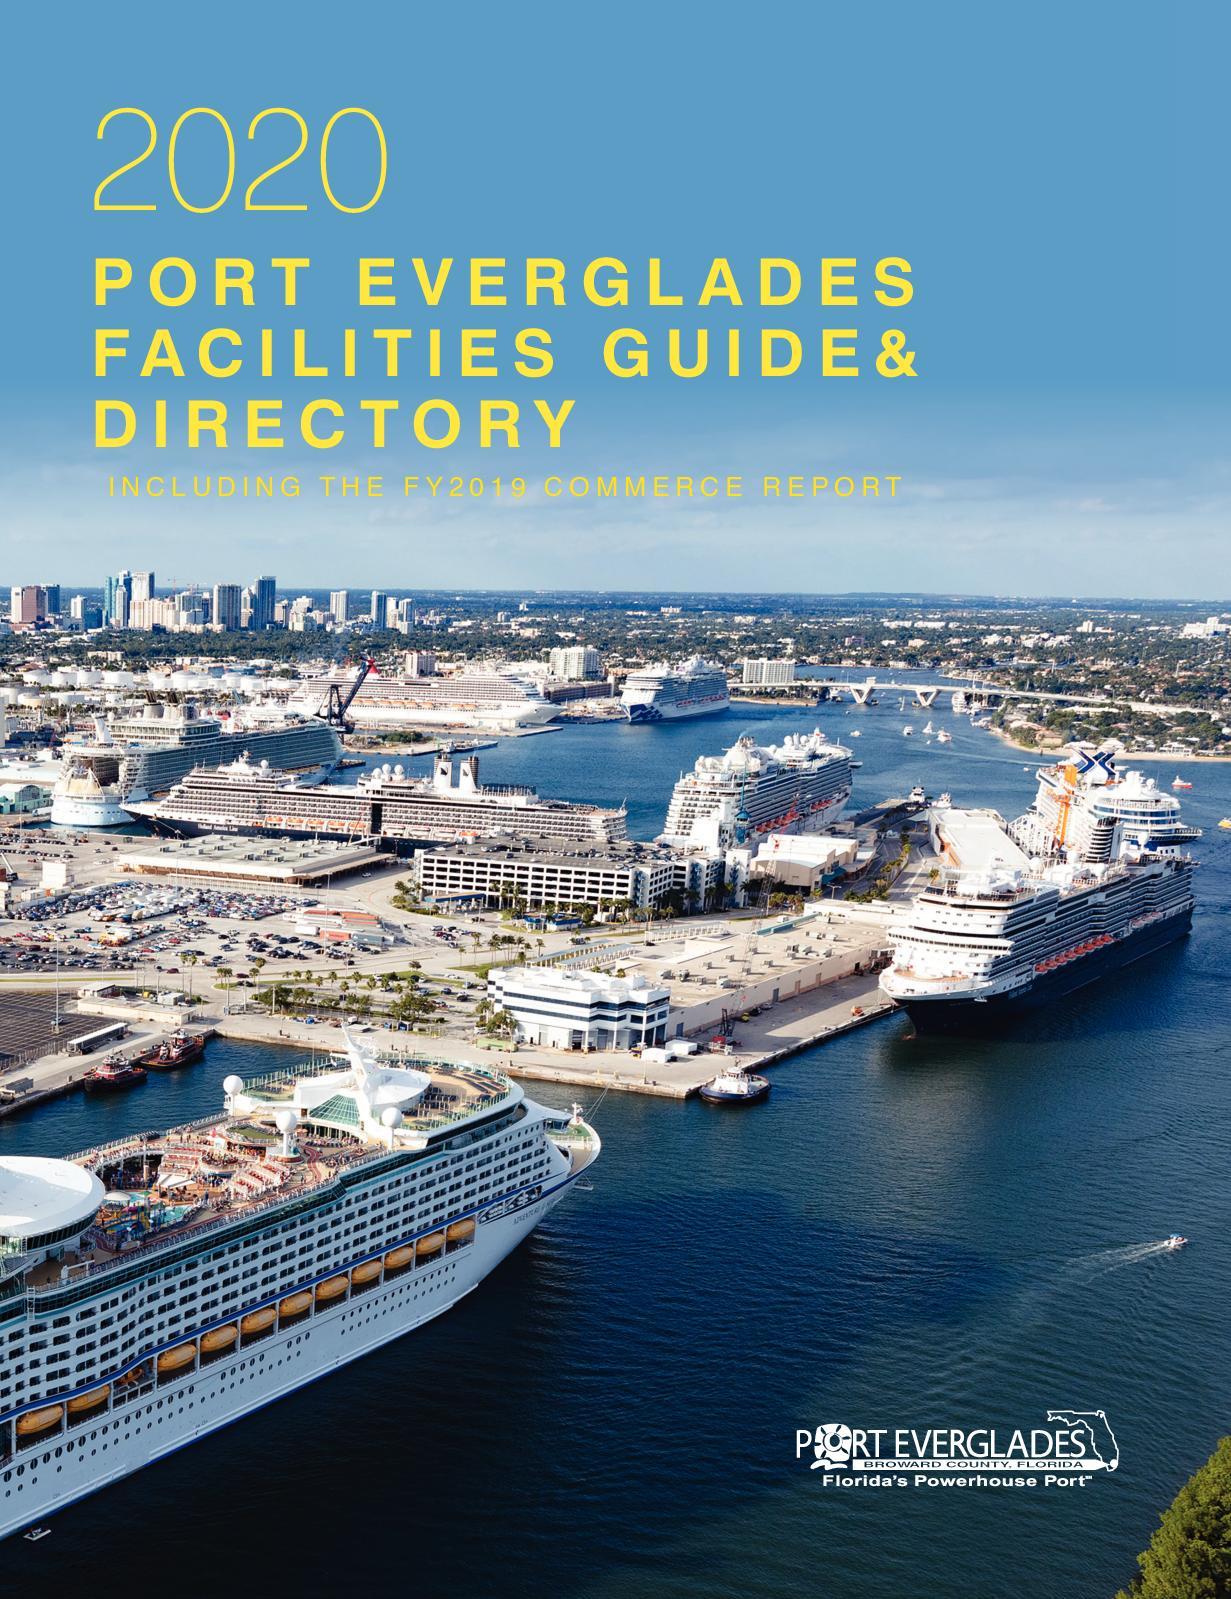 12+ Calaméo   8 Port Everglades Facilities Guide & Directory Kollektion